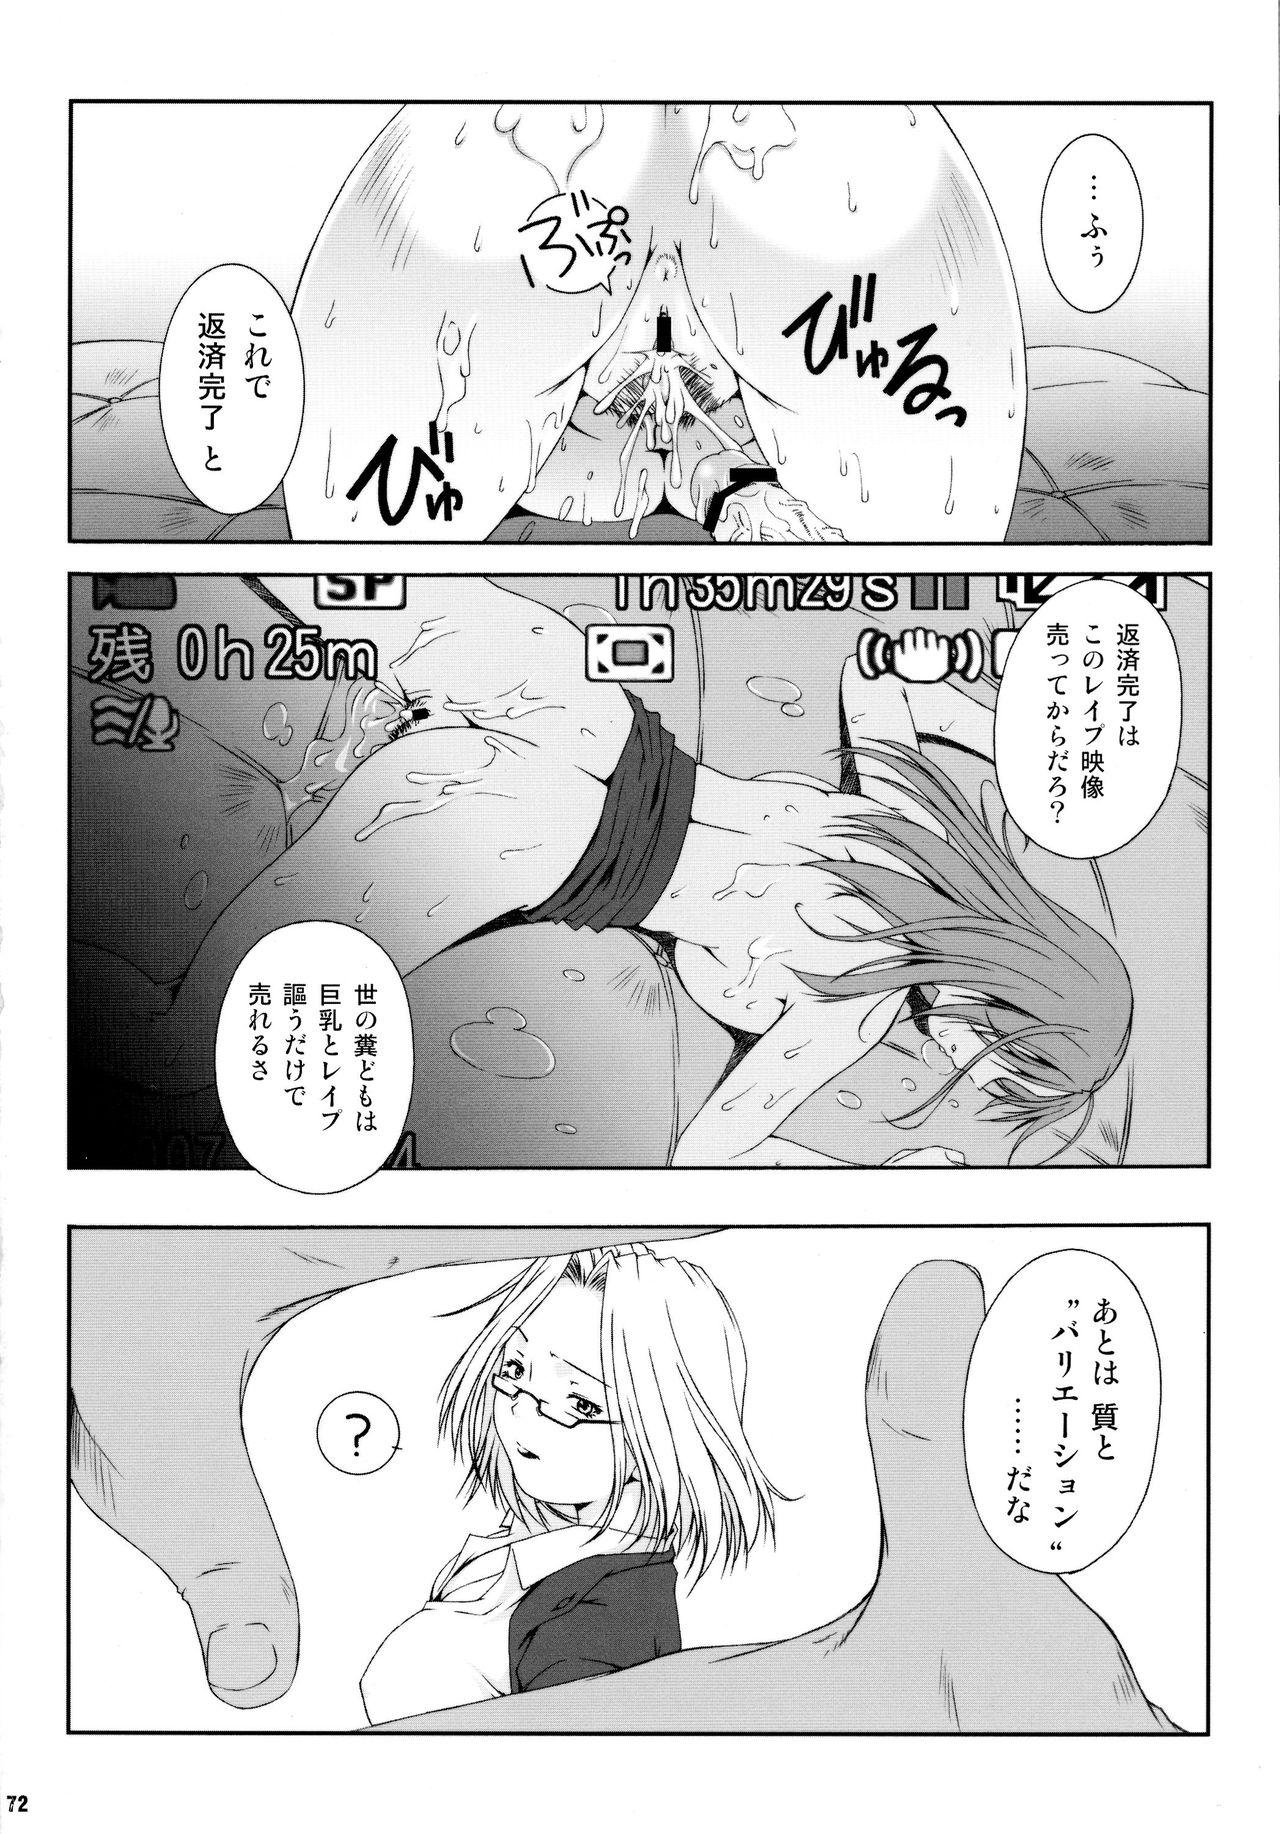 Misoka no 5 71